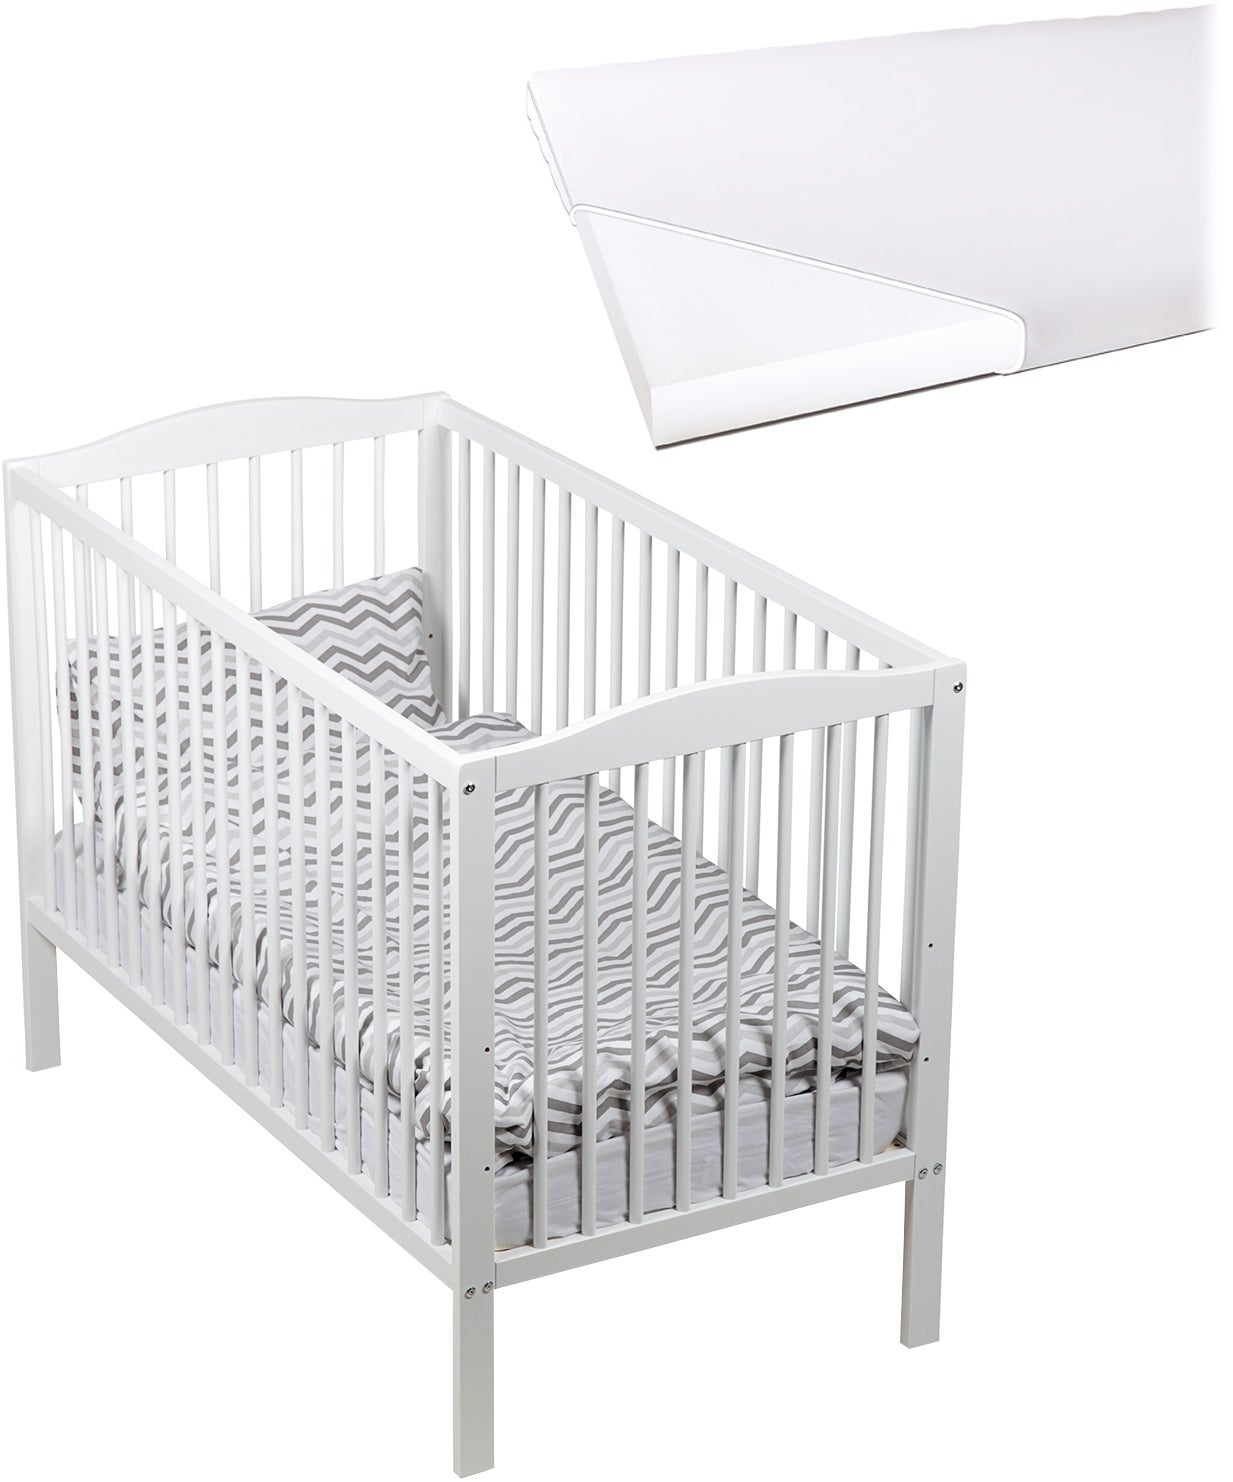 JLY Dream Pinnasänky + BabyMatex Softi Patja 60x120, Valkoinen